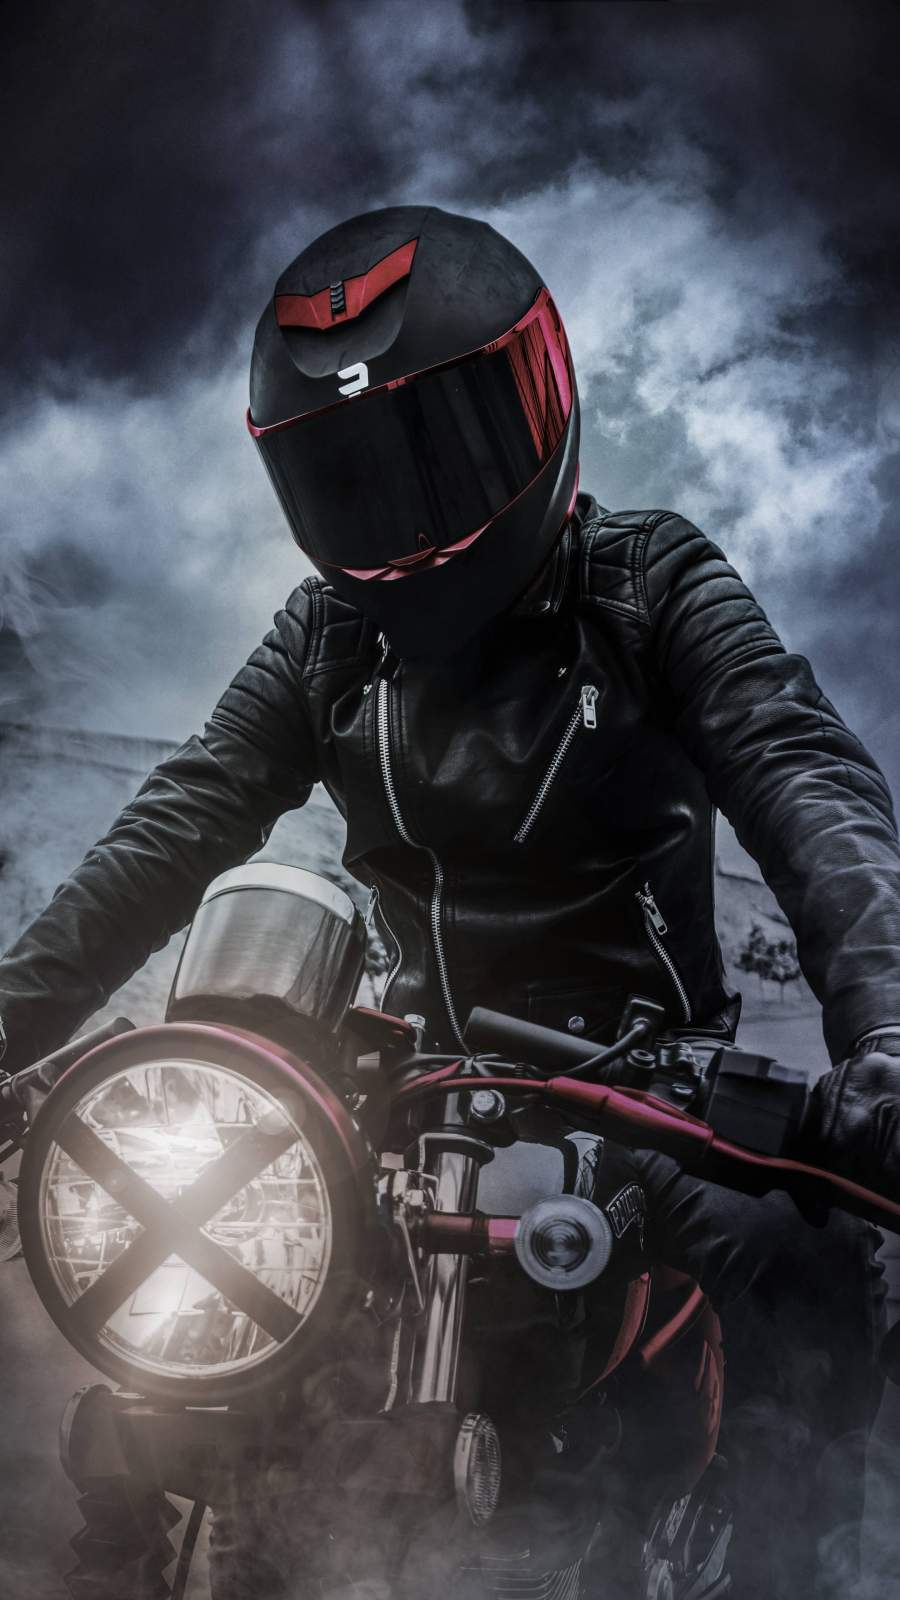 Motorcycle Rider iPhone Wallpaper